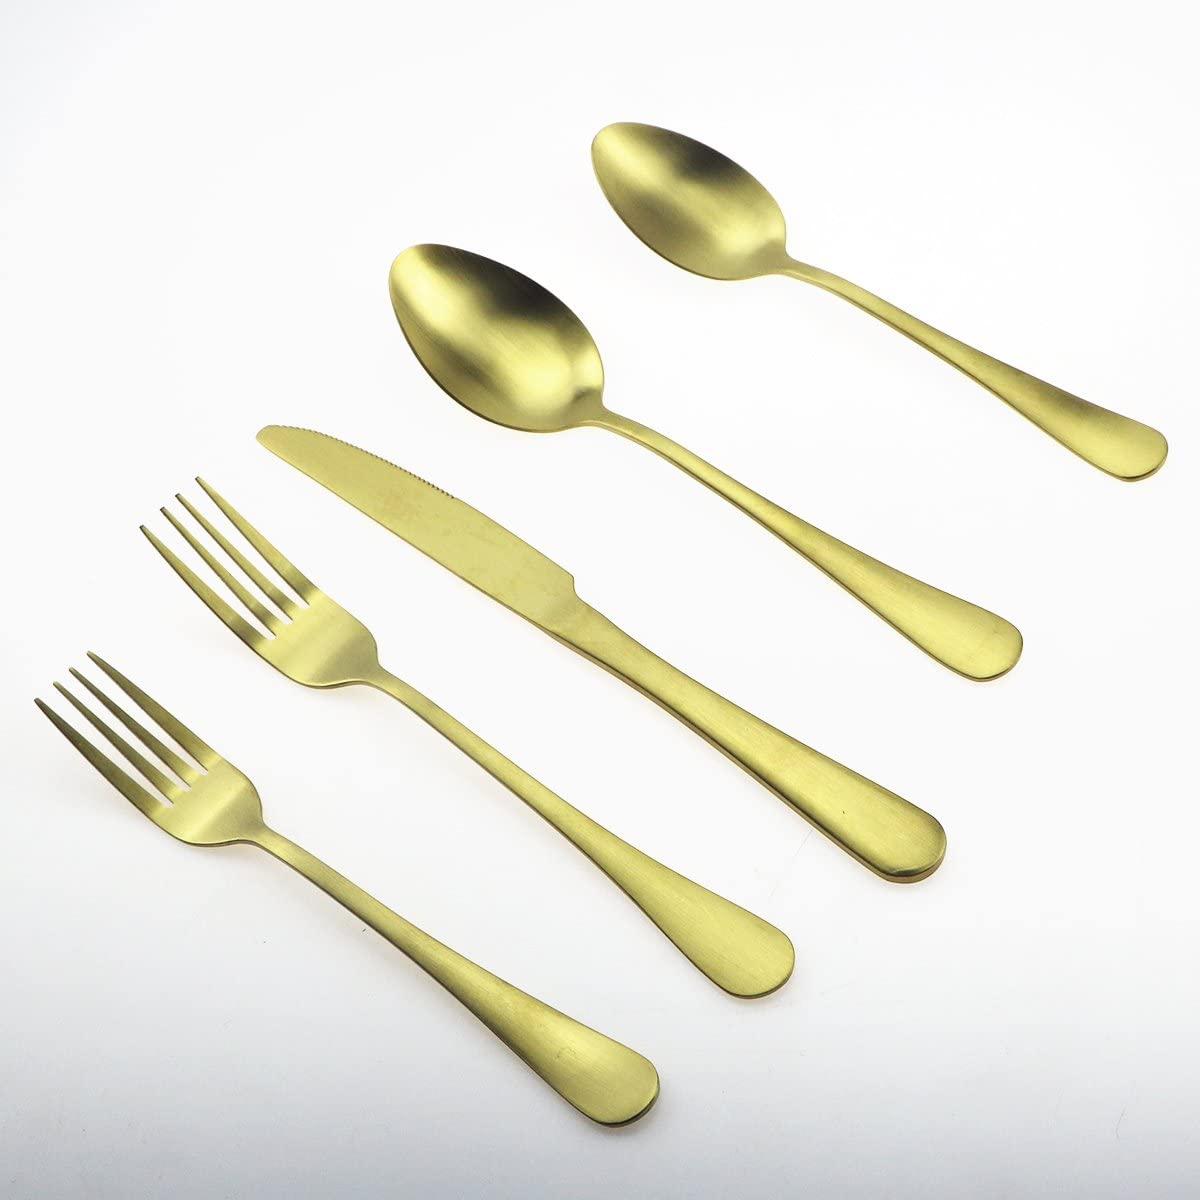 JANKNG 20-Piece 18/10 high-class Stainless Steel Flatware Set Matte Gold, Service for 4